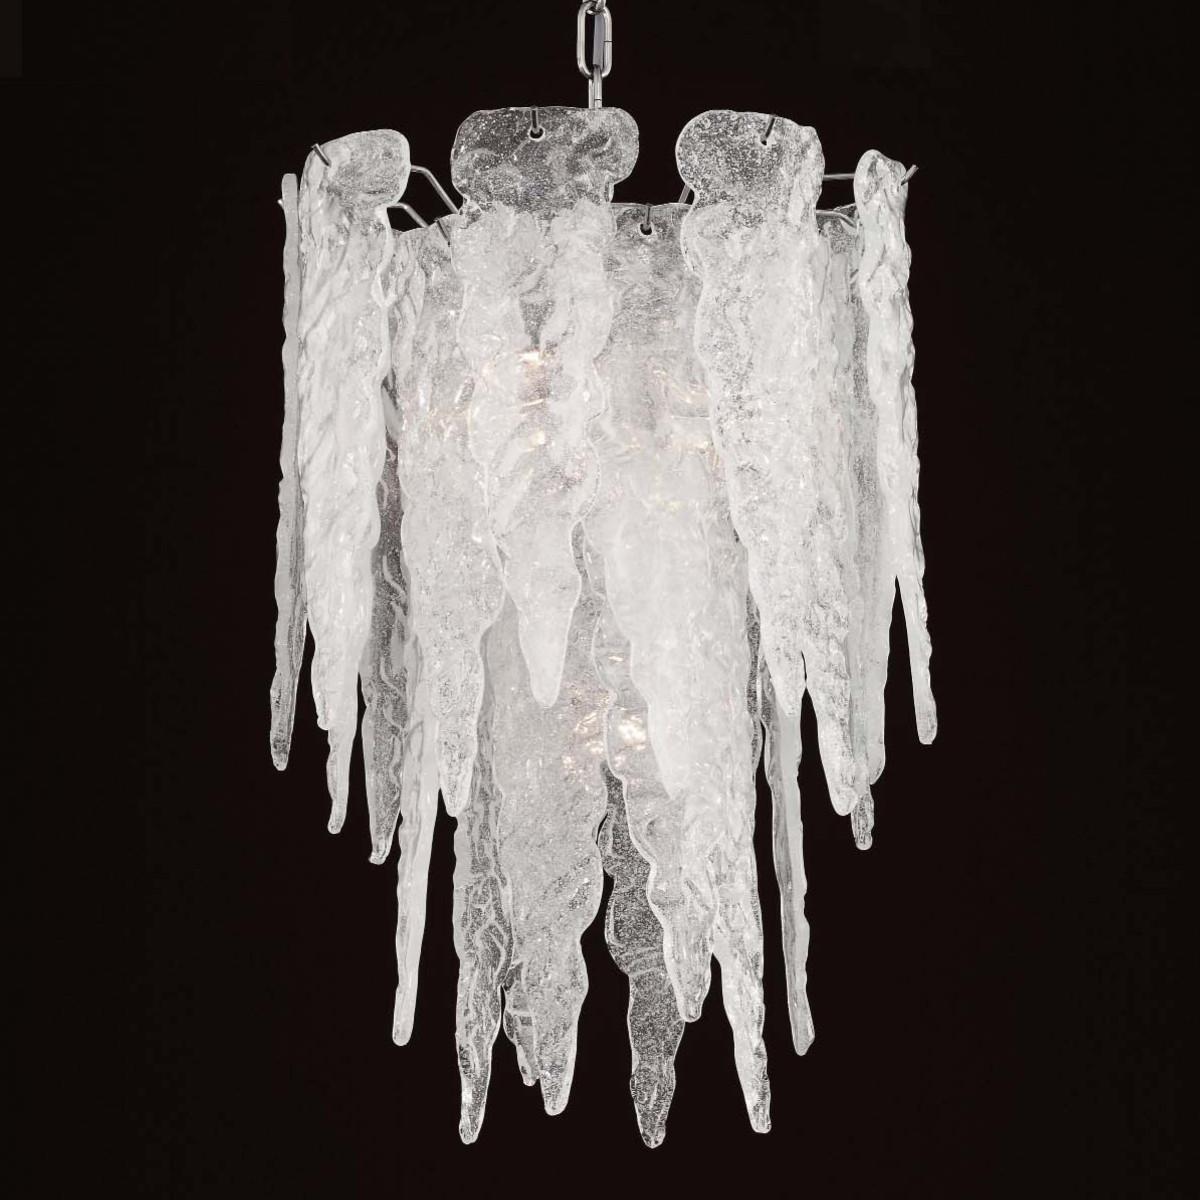 """Stalattite"" lustre en verre de Murano - 4 lumieres"